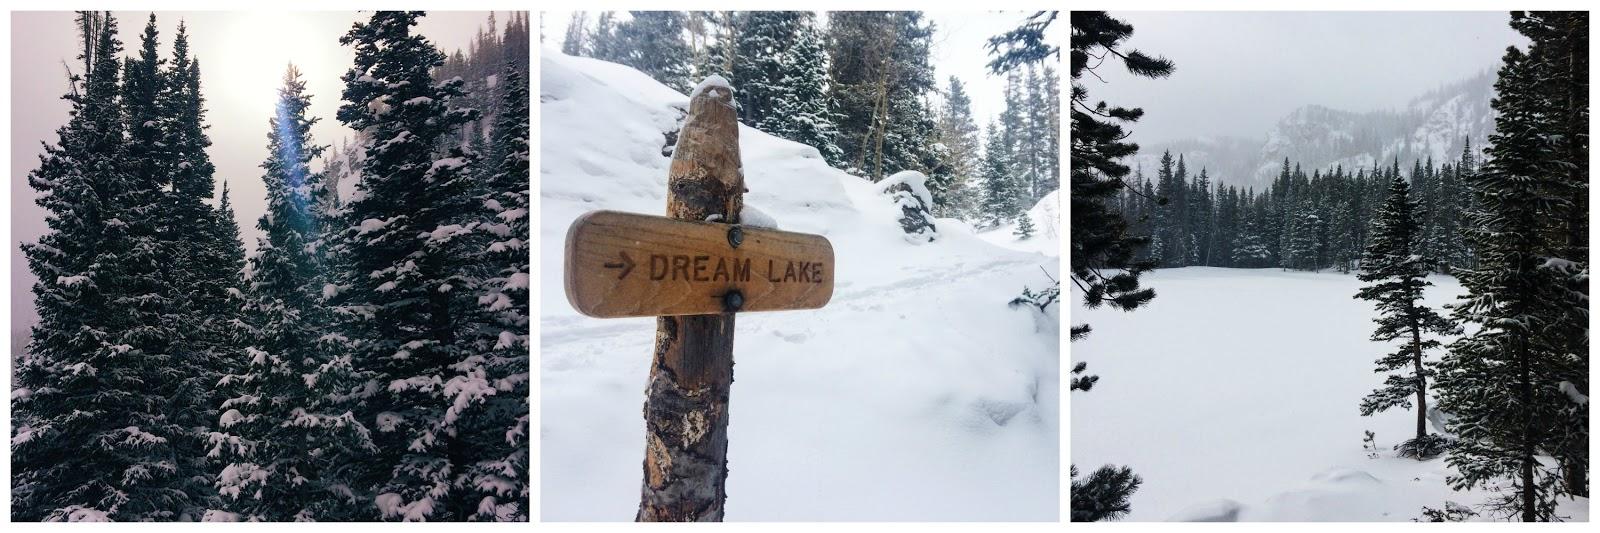 Dream Lake Trail Rocky Mountain National Park